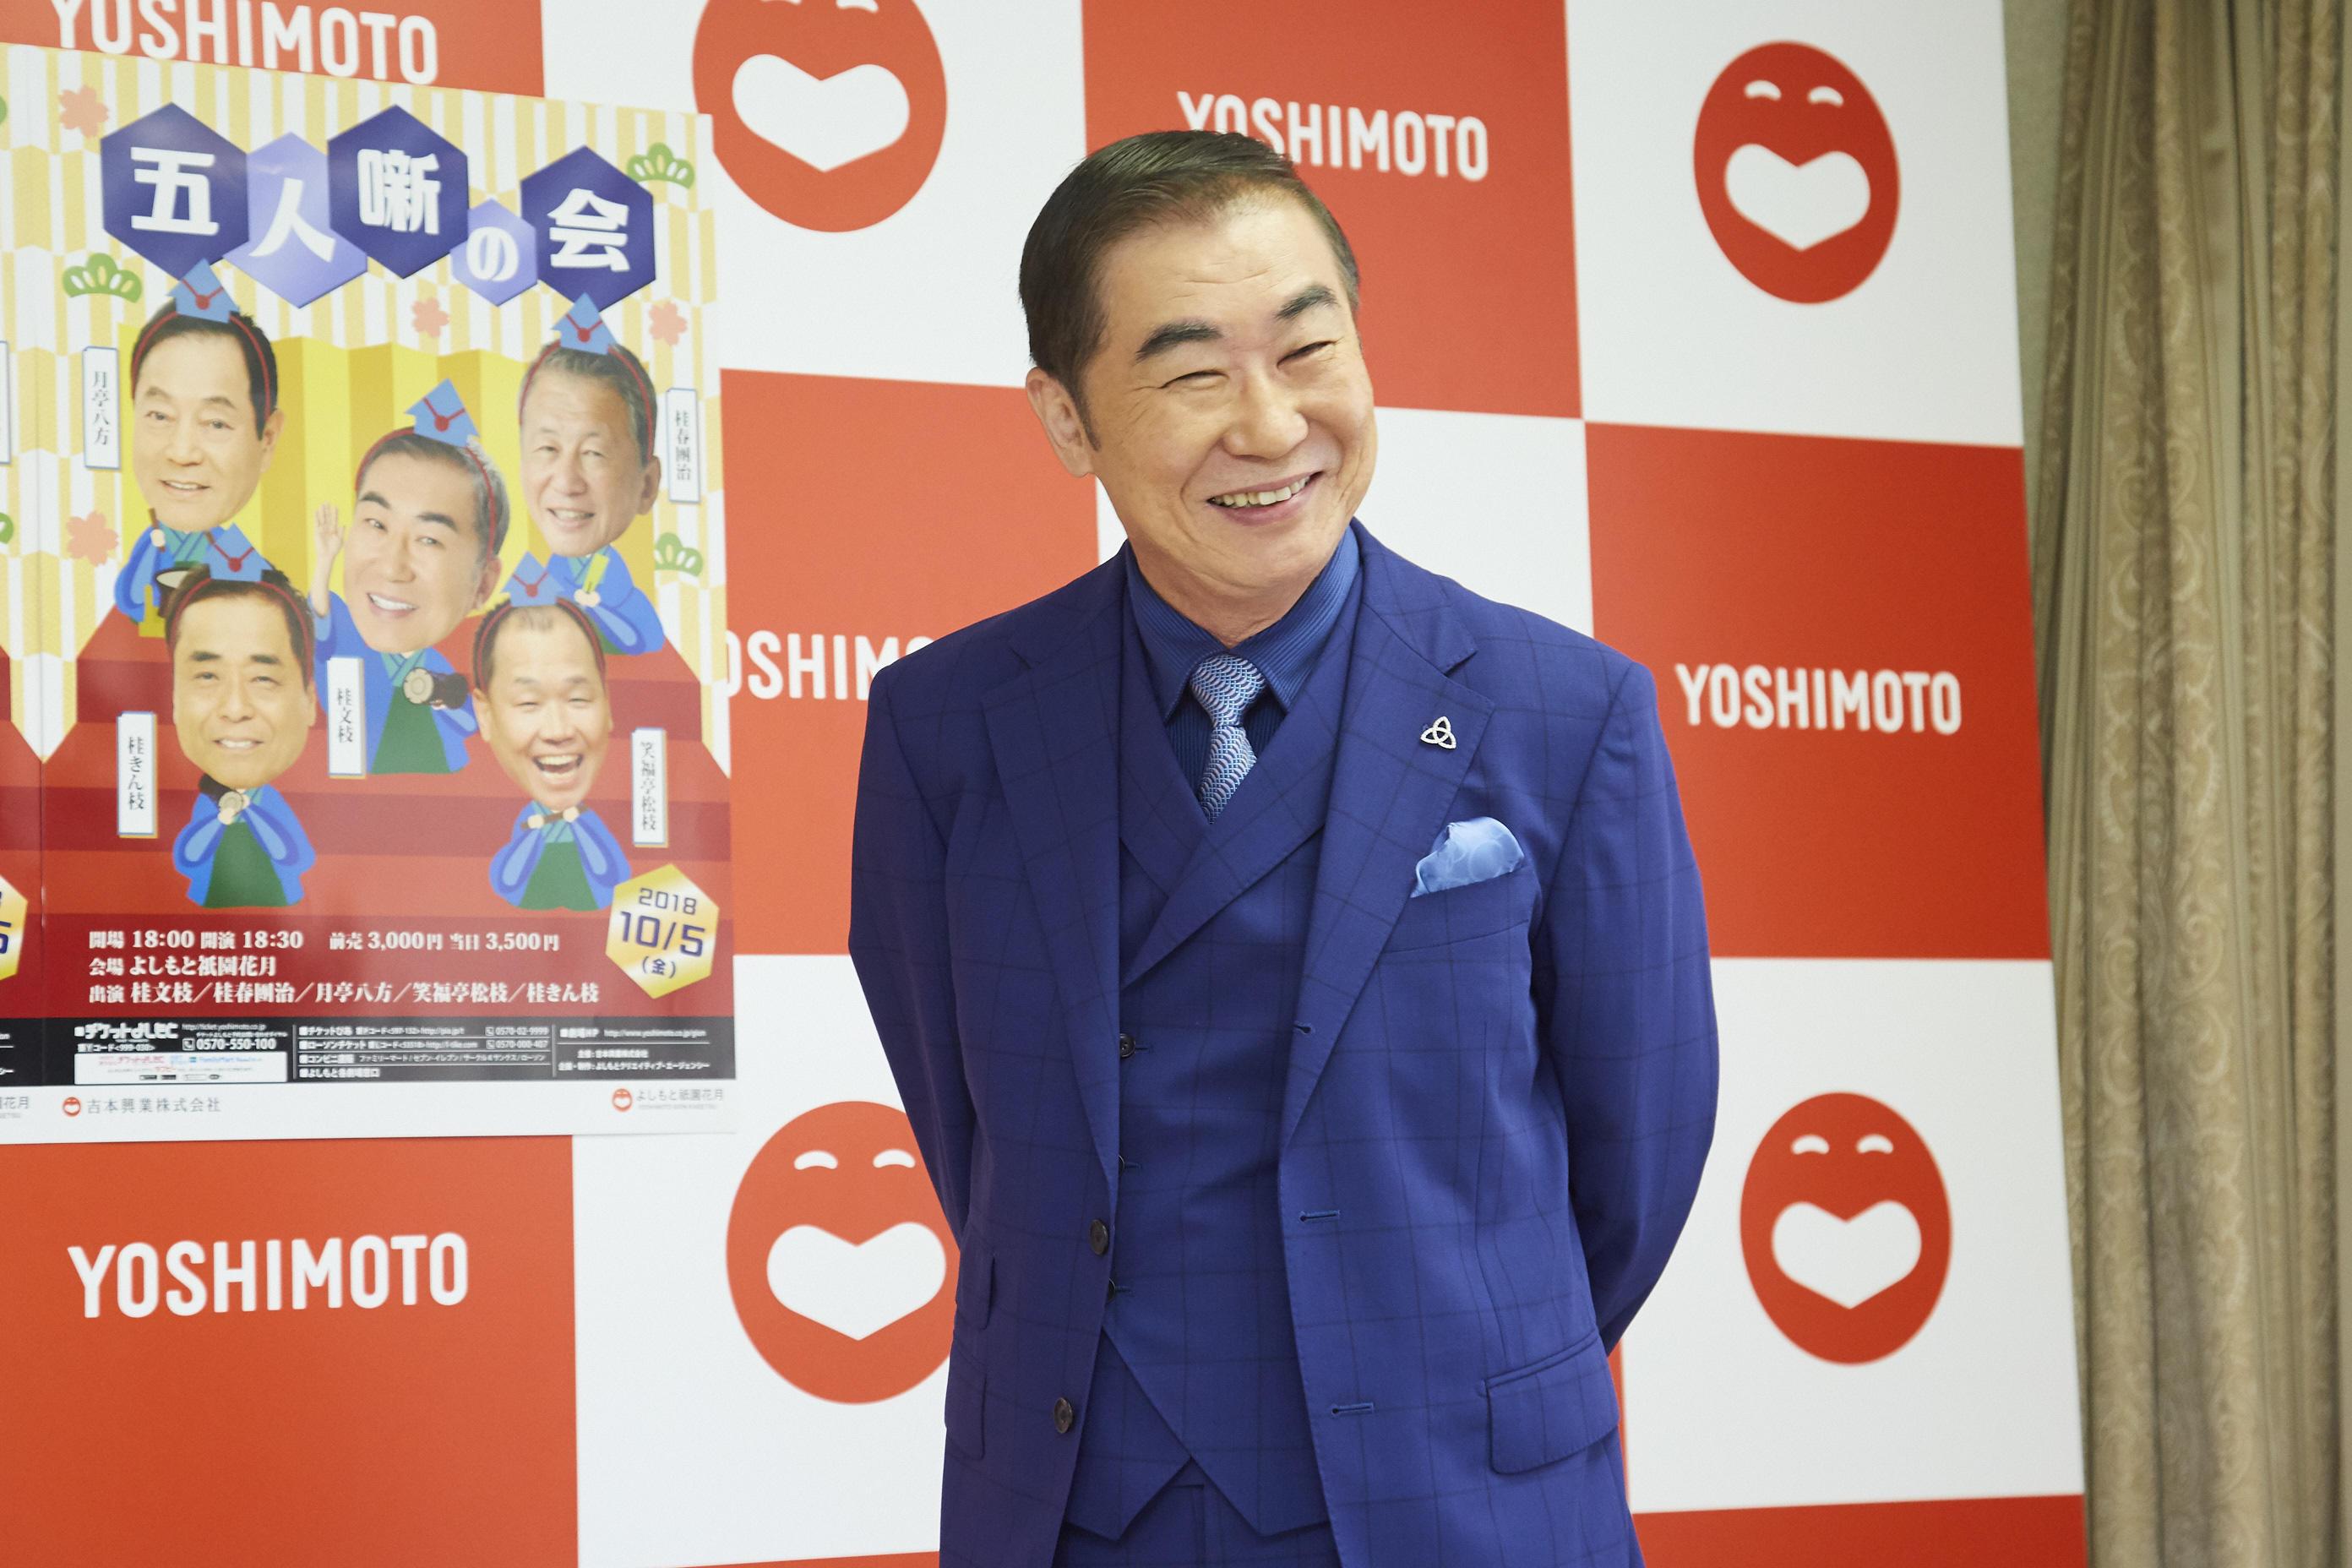 http://news.yoshimoto.co.jp/20180913204052-994e7fba321d557490ecc7cbcc0921bc293734e7.jpg